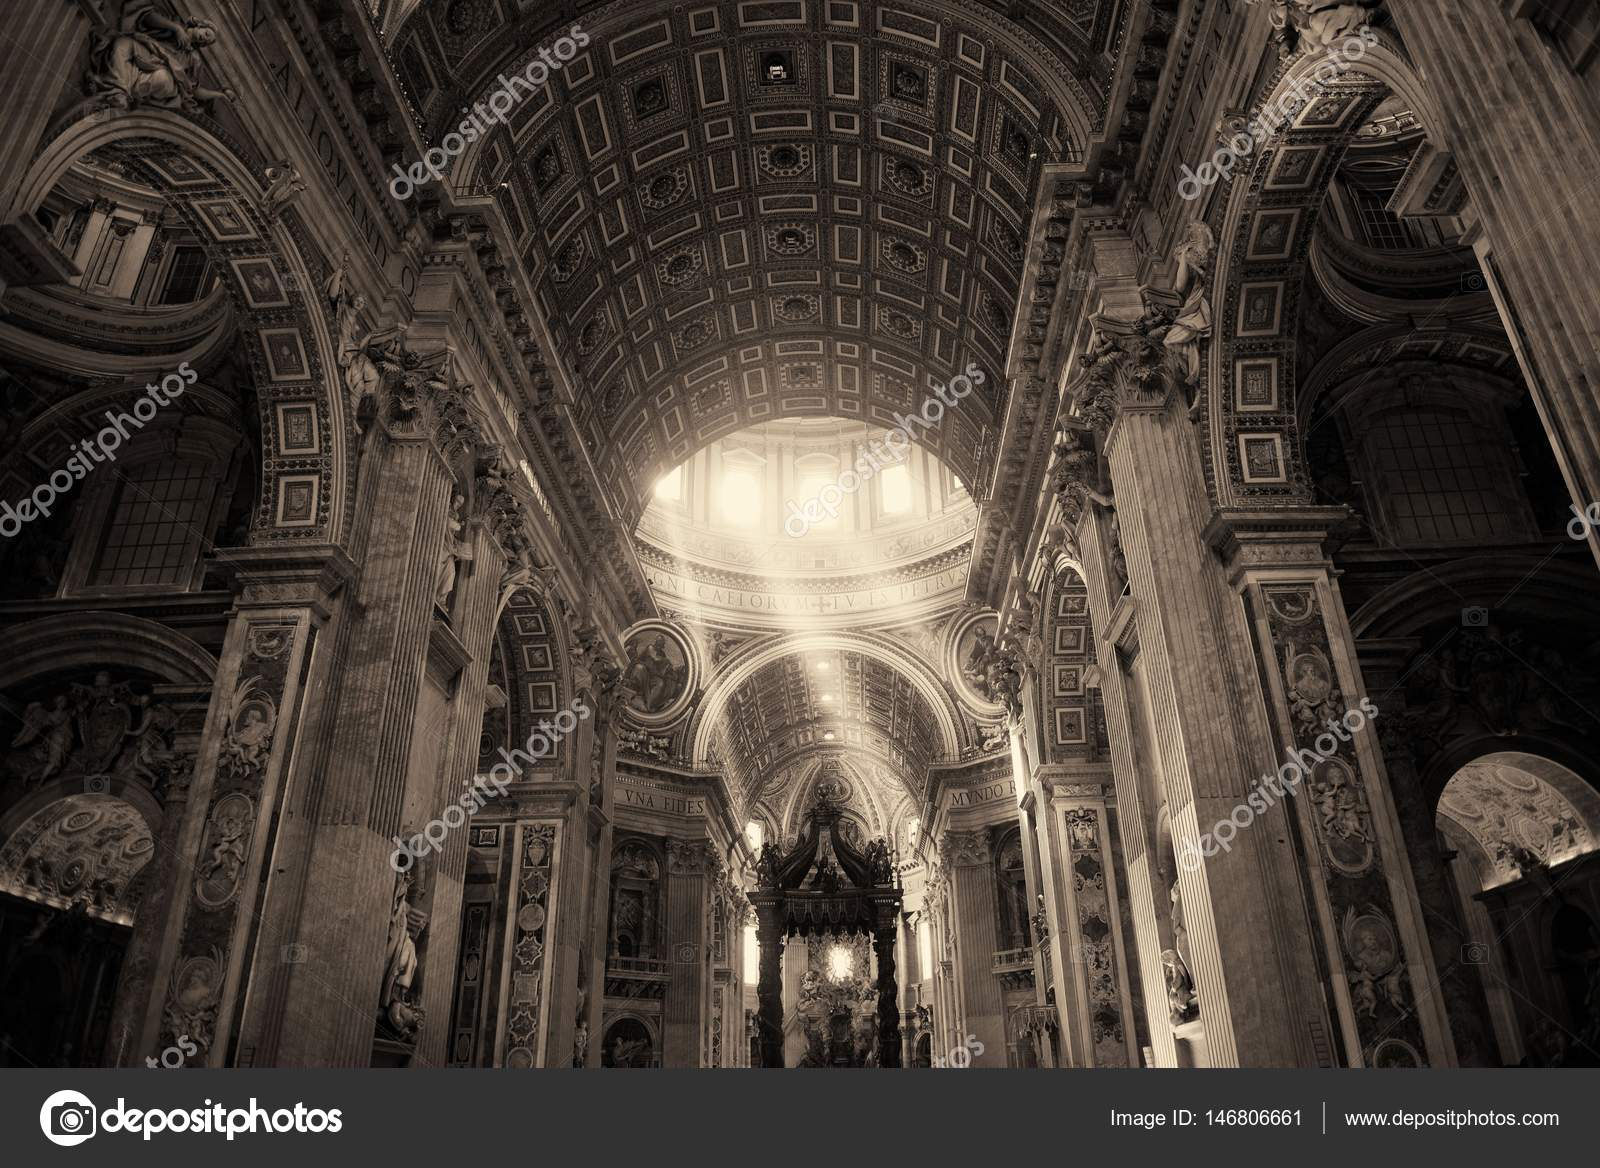 https://st3.depositphotos.com/1030808/14680/i/1600/depositphotos_146806661-stock-photo-st-peters-basilica-interior.jpg